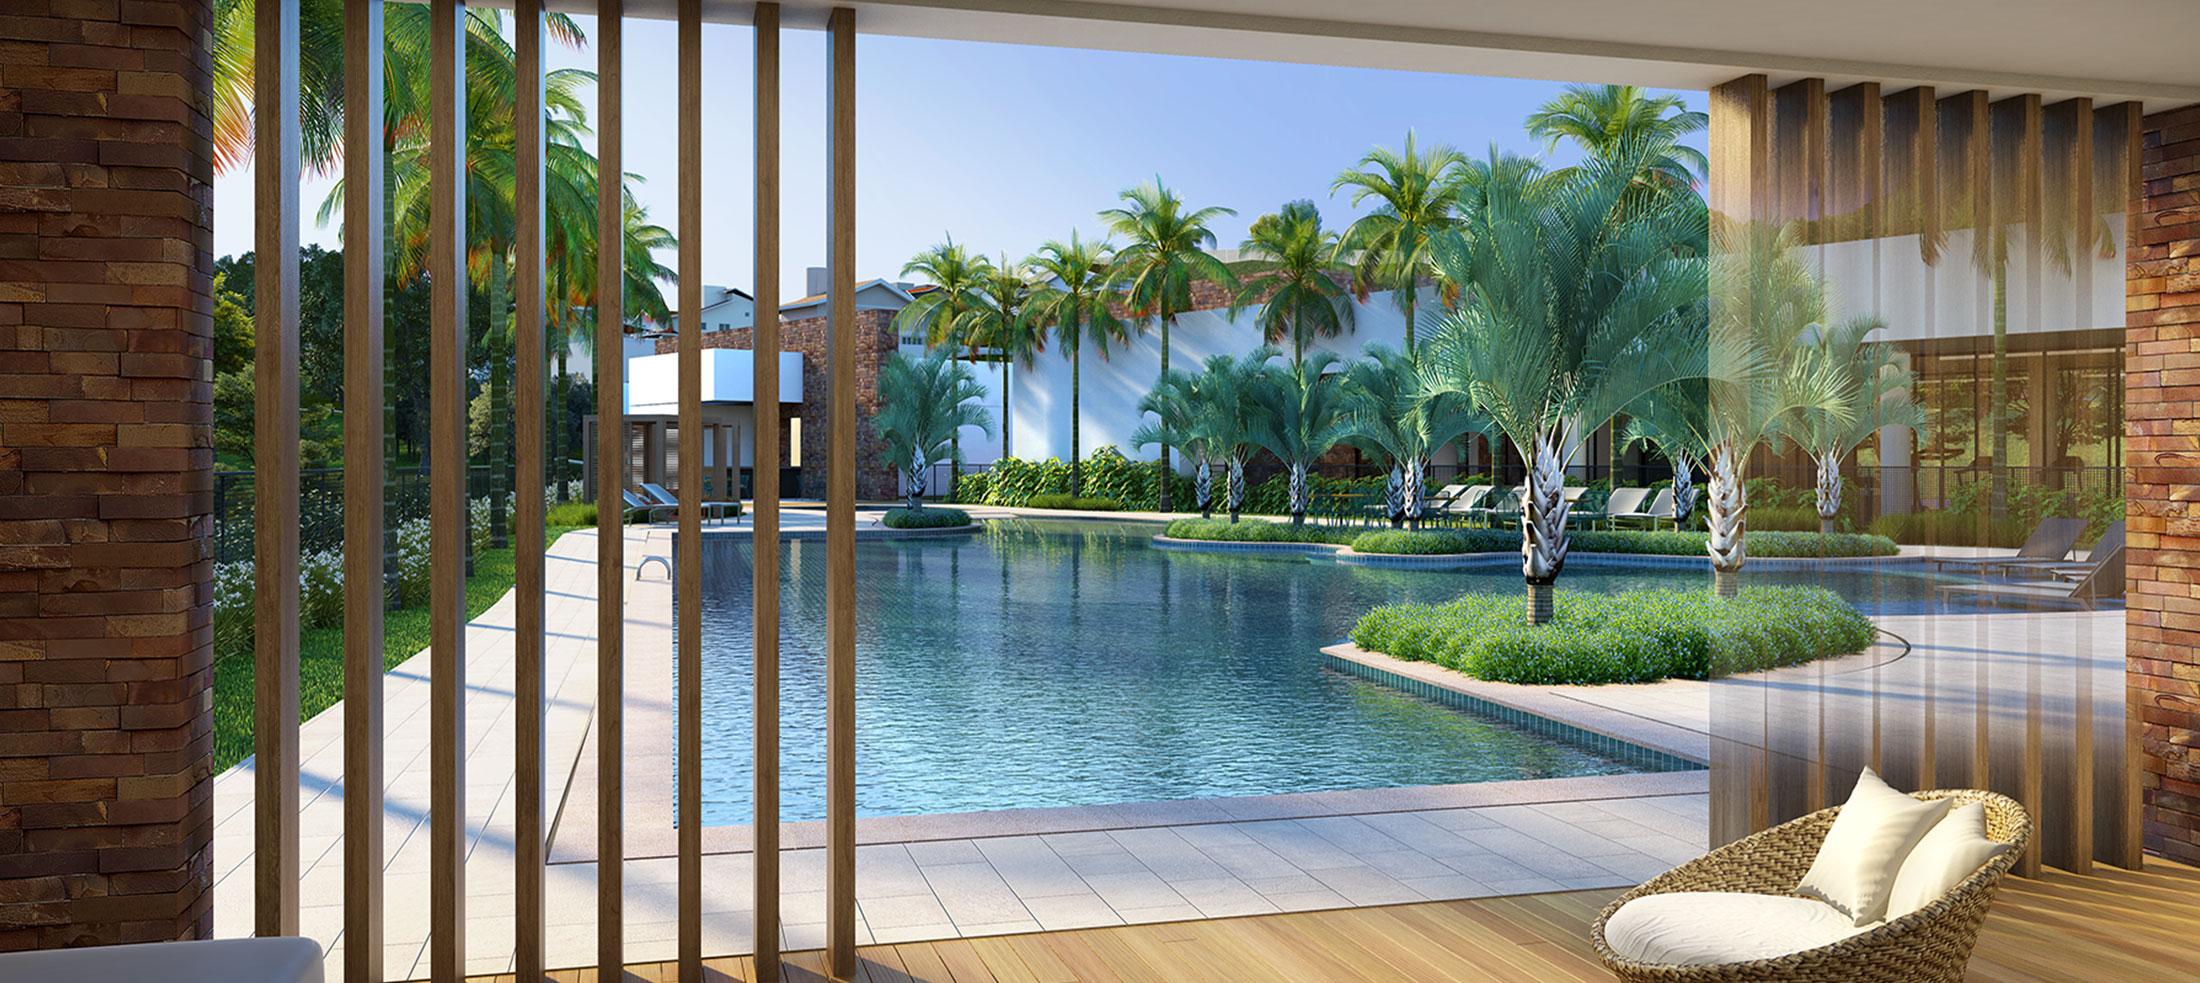 poolhouse.jpg